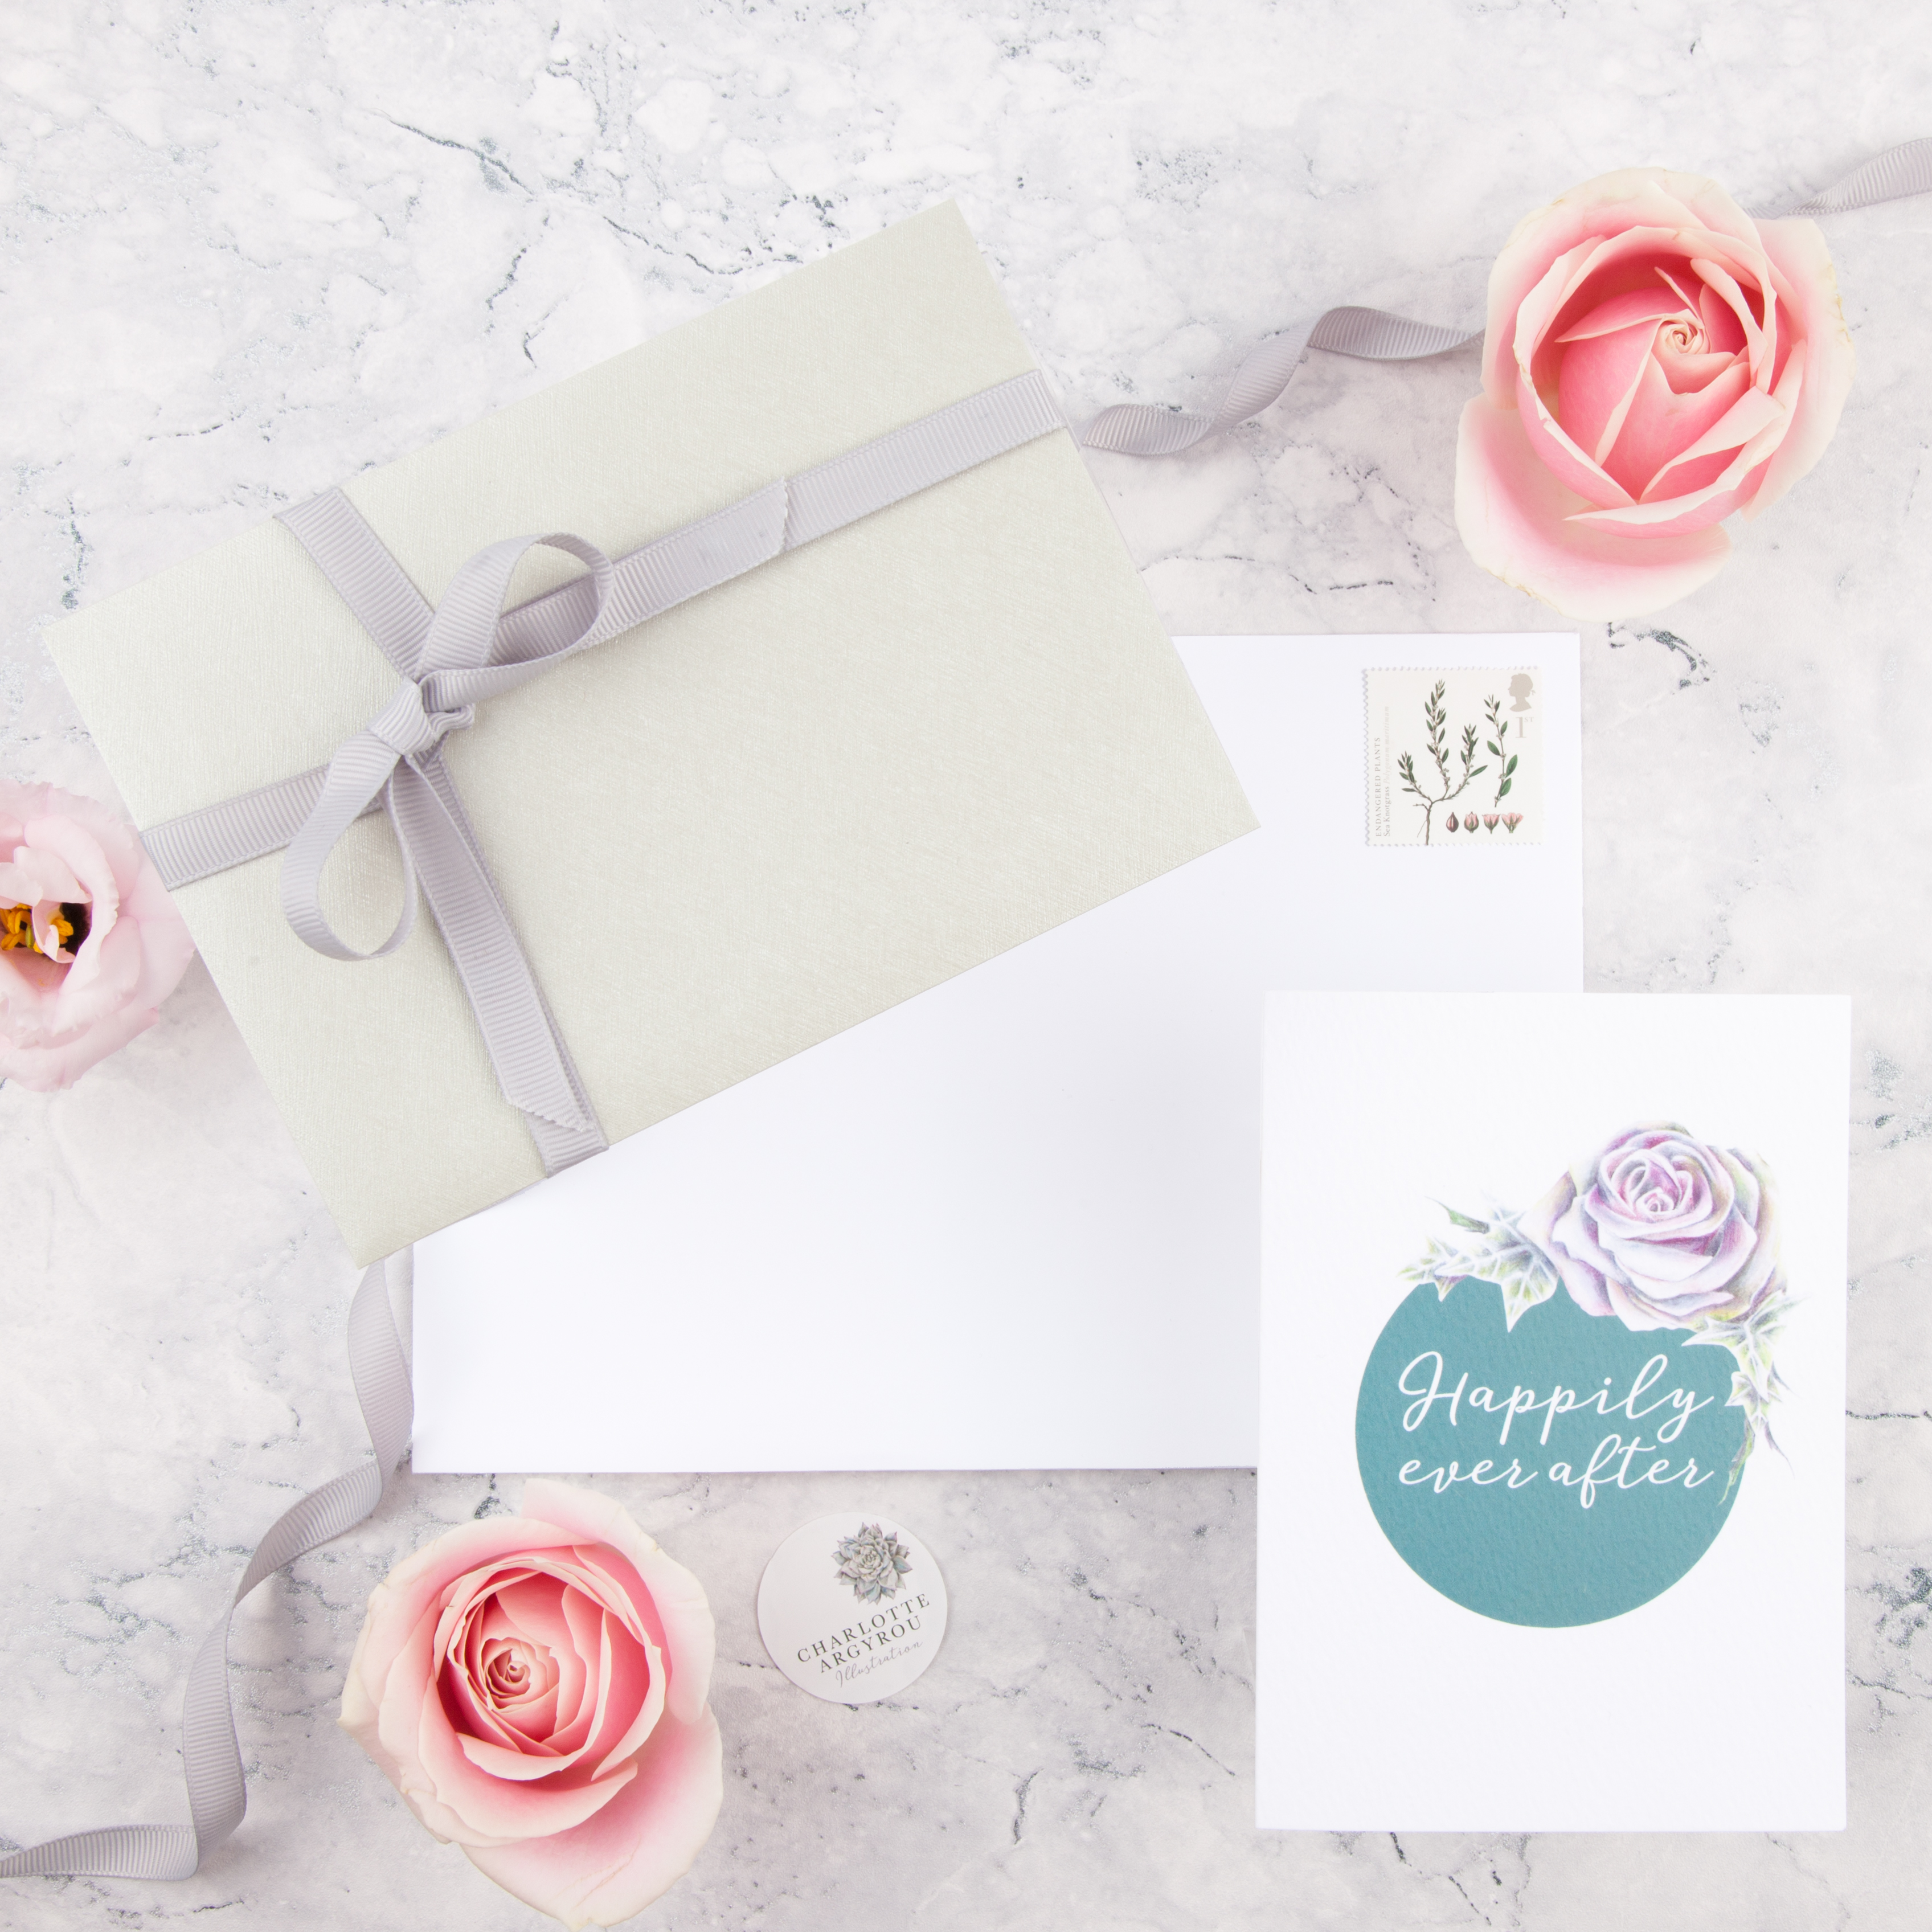 Wedding Bouquet Illustration Service: Gift Giver – Charlotte Argyrou ...